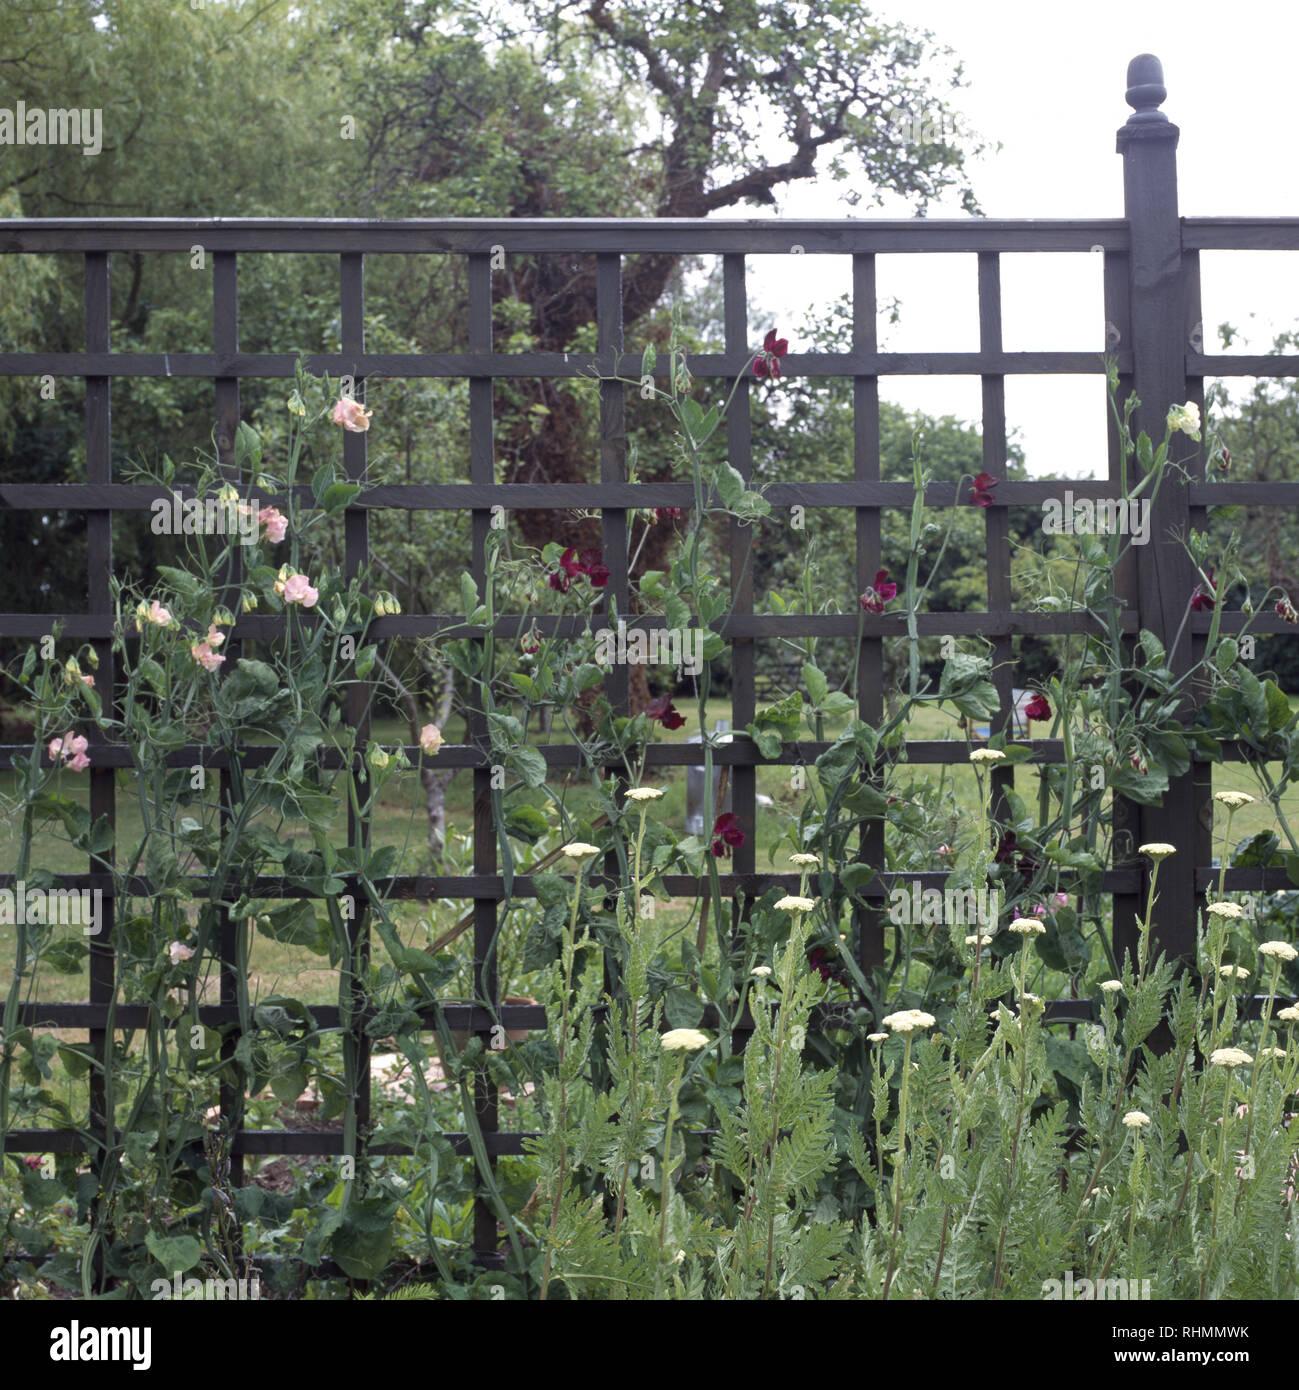 Sweet Peas Growing On Metal Trellis Fence Stock Photo Alamy